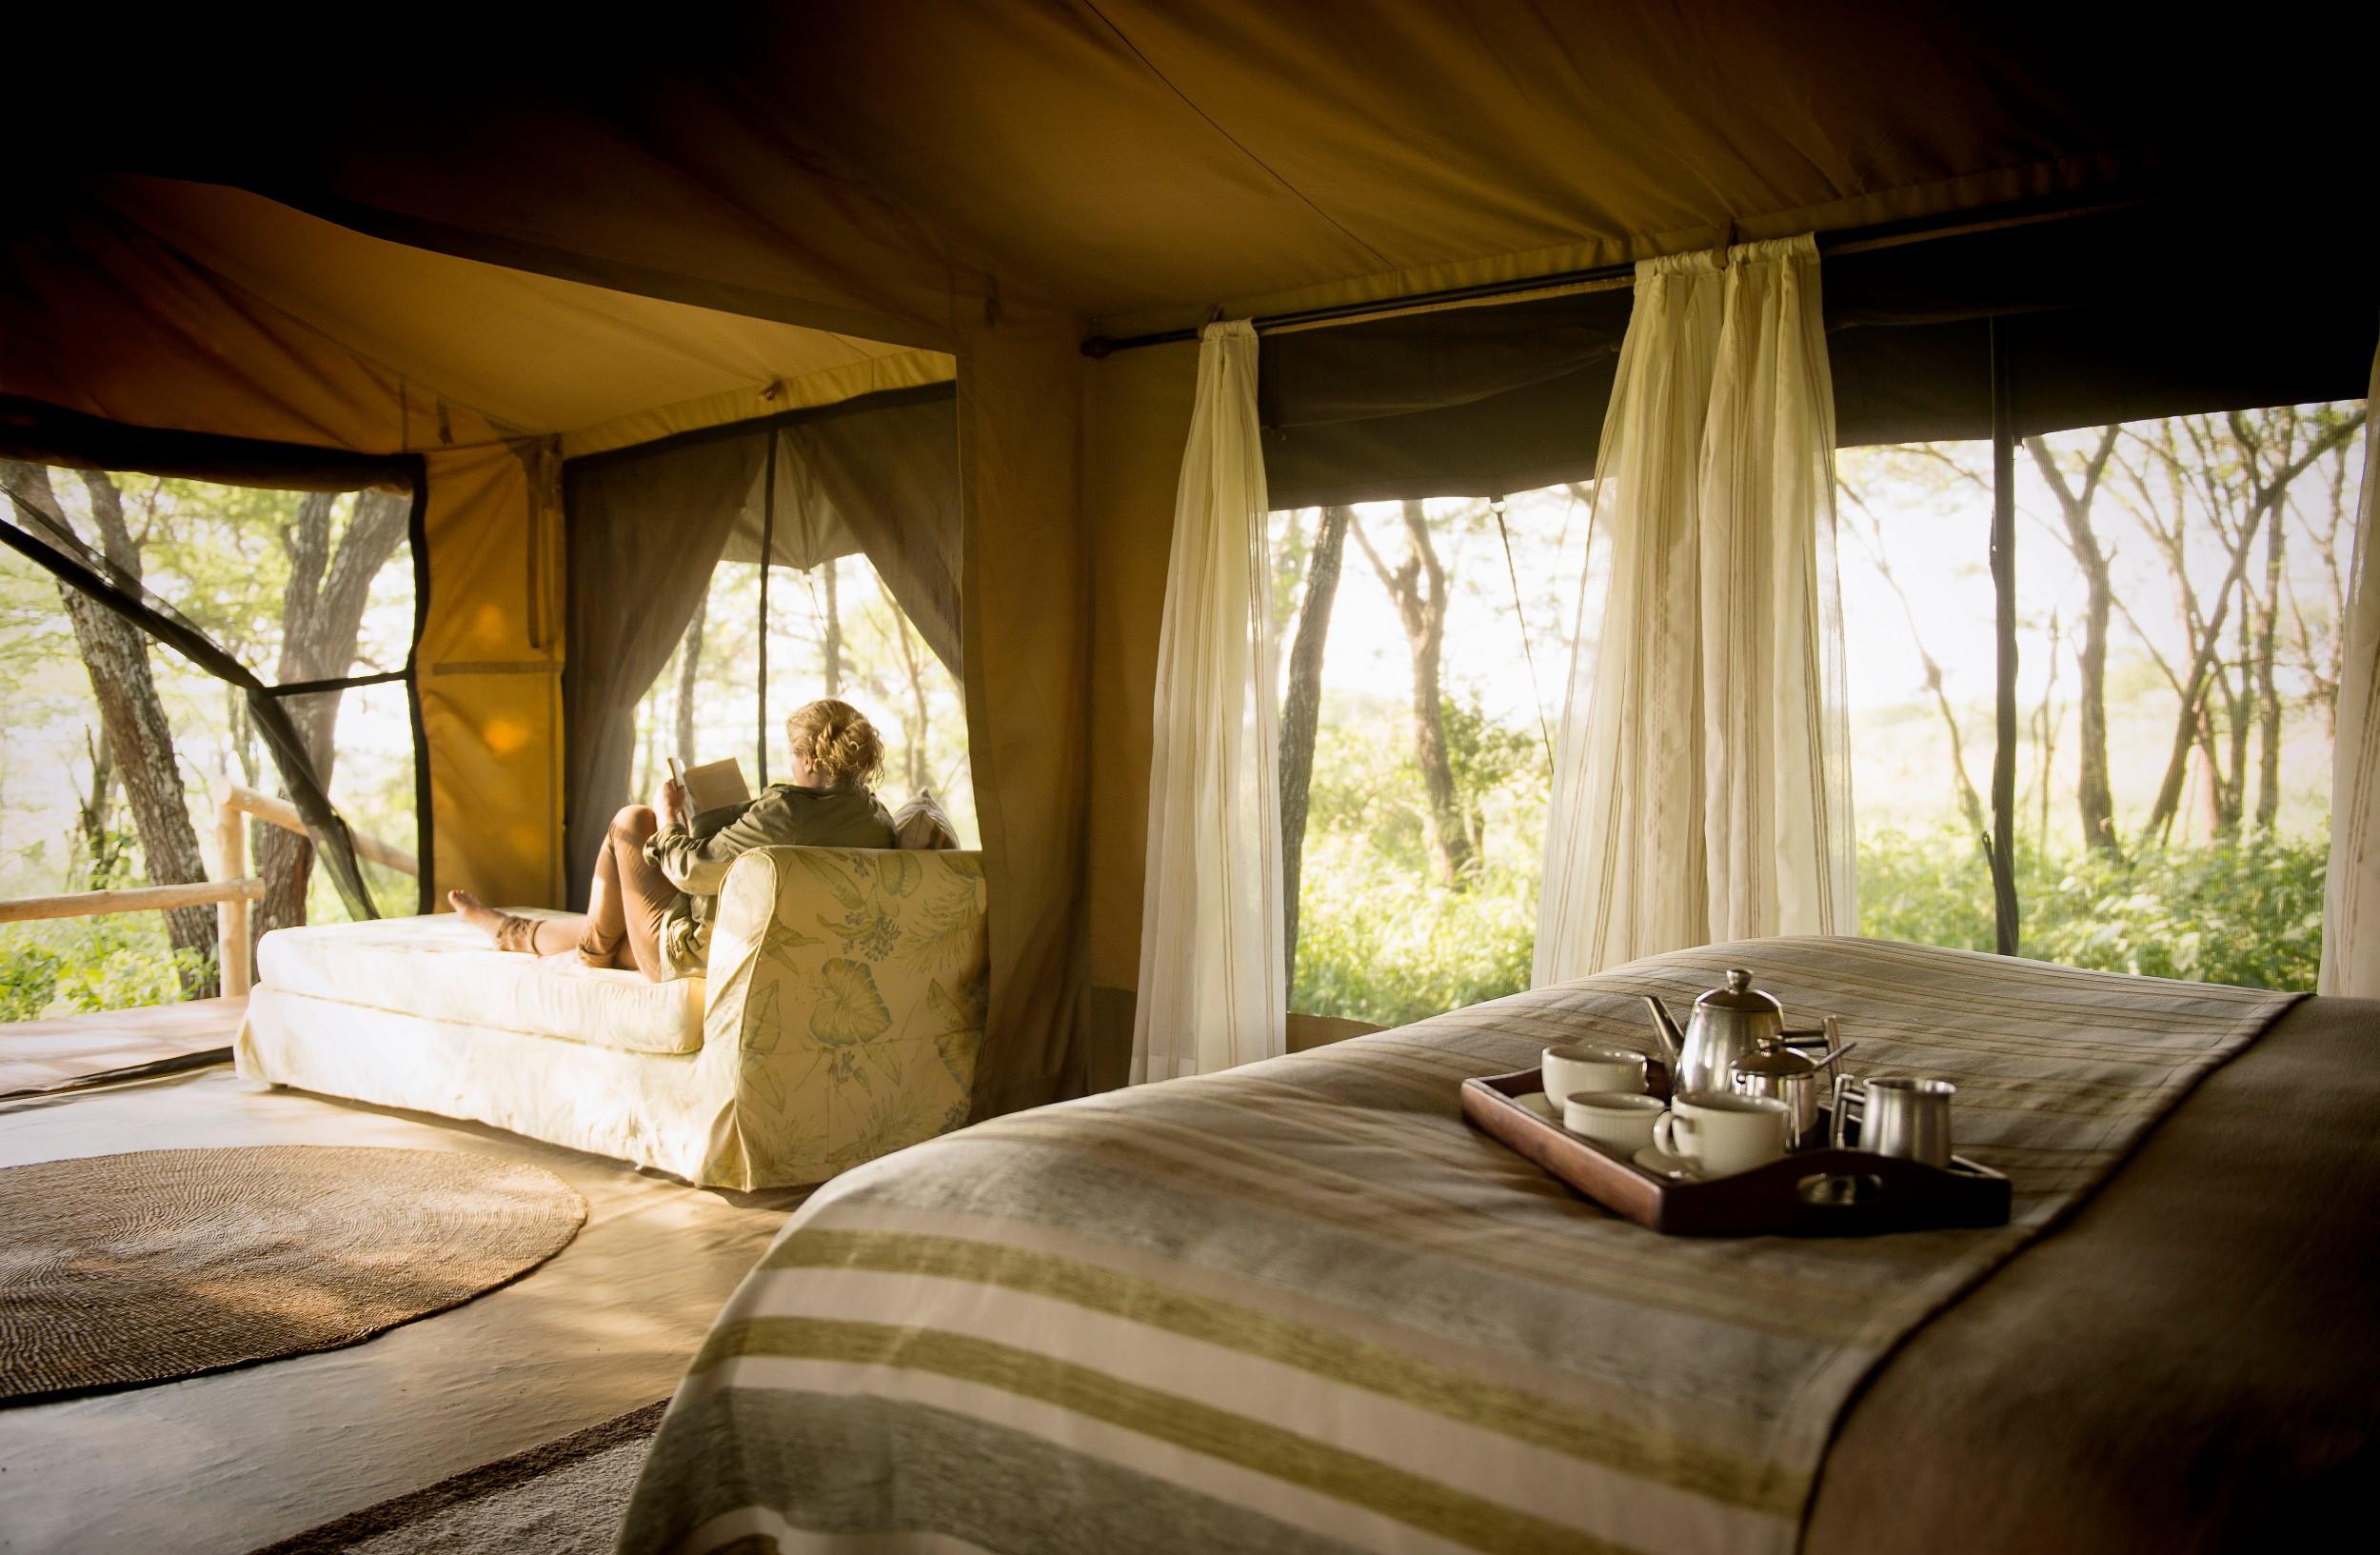 Dunia-Camp-Guest-Bedrom-tent-interior-HR-Eliza-Deacon.jpg